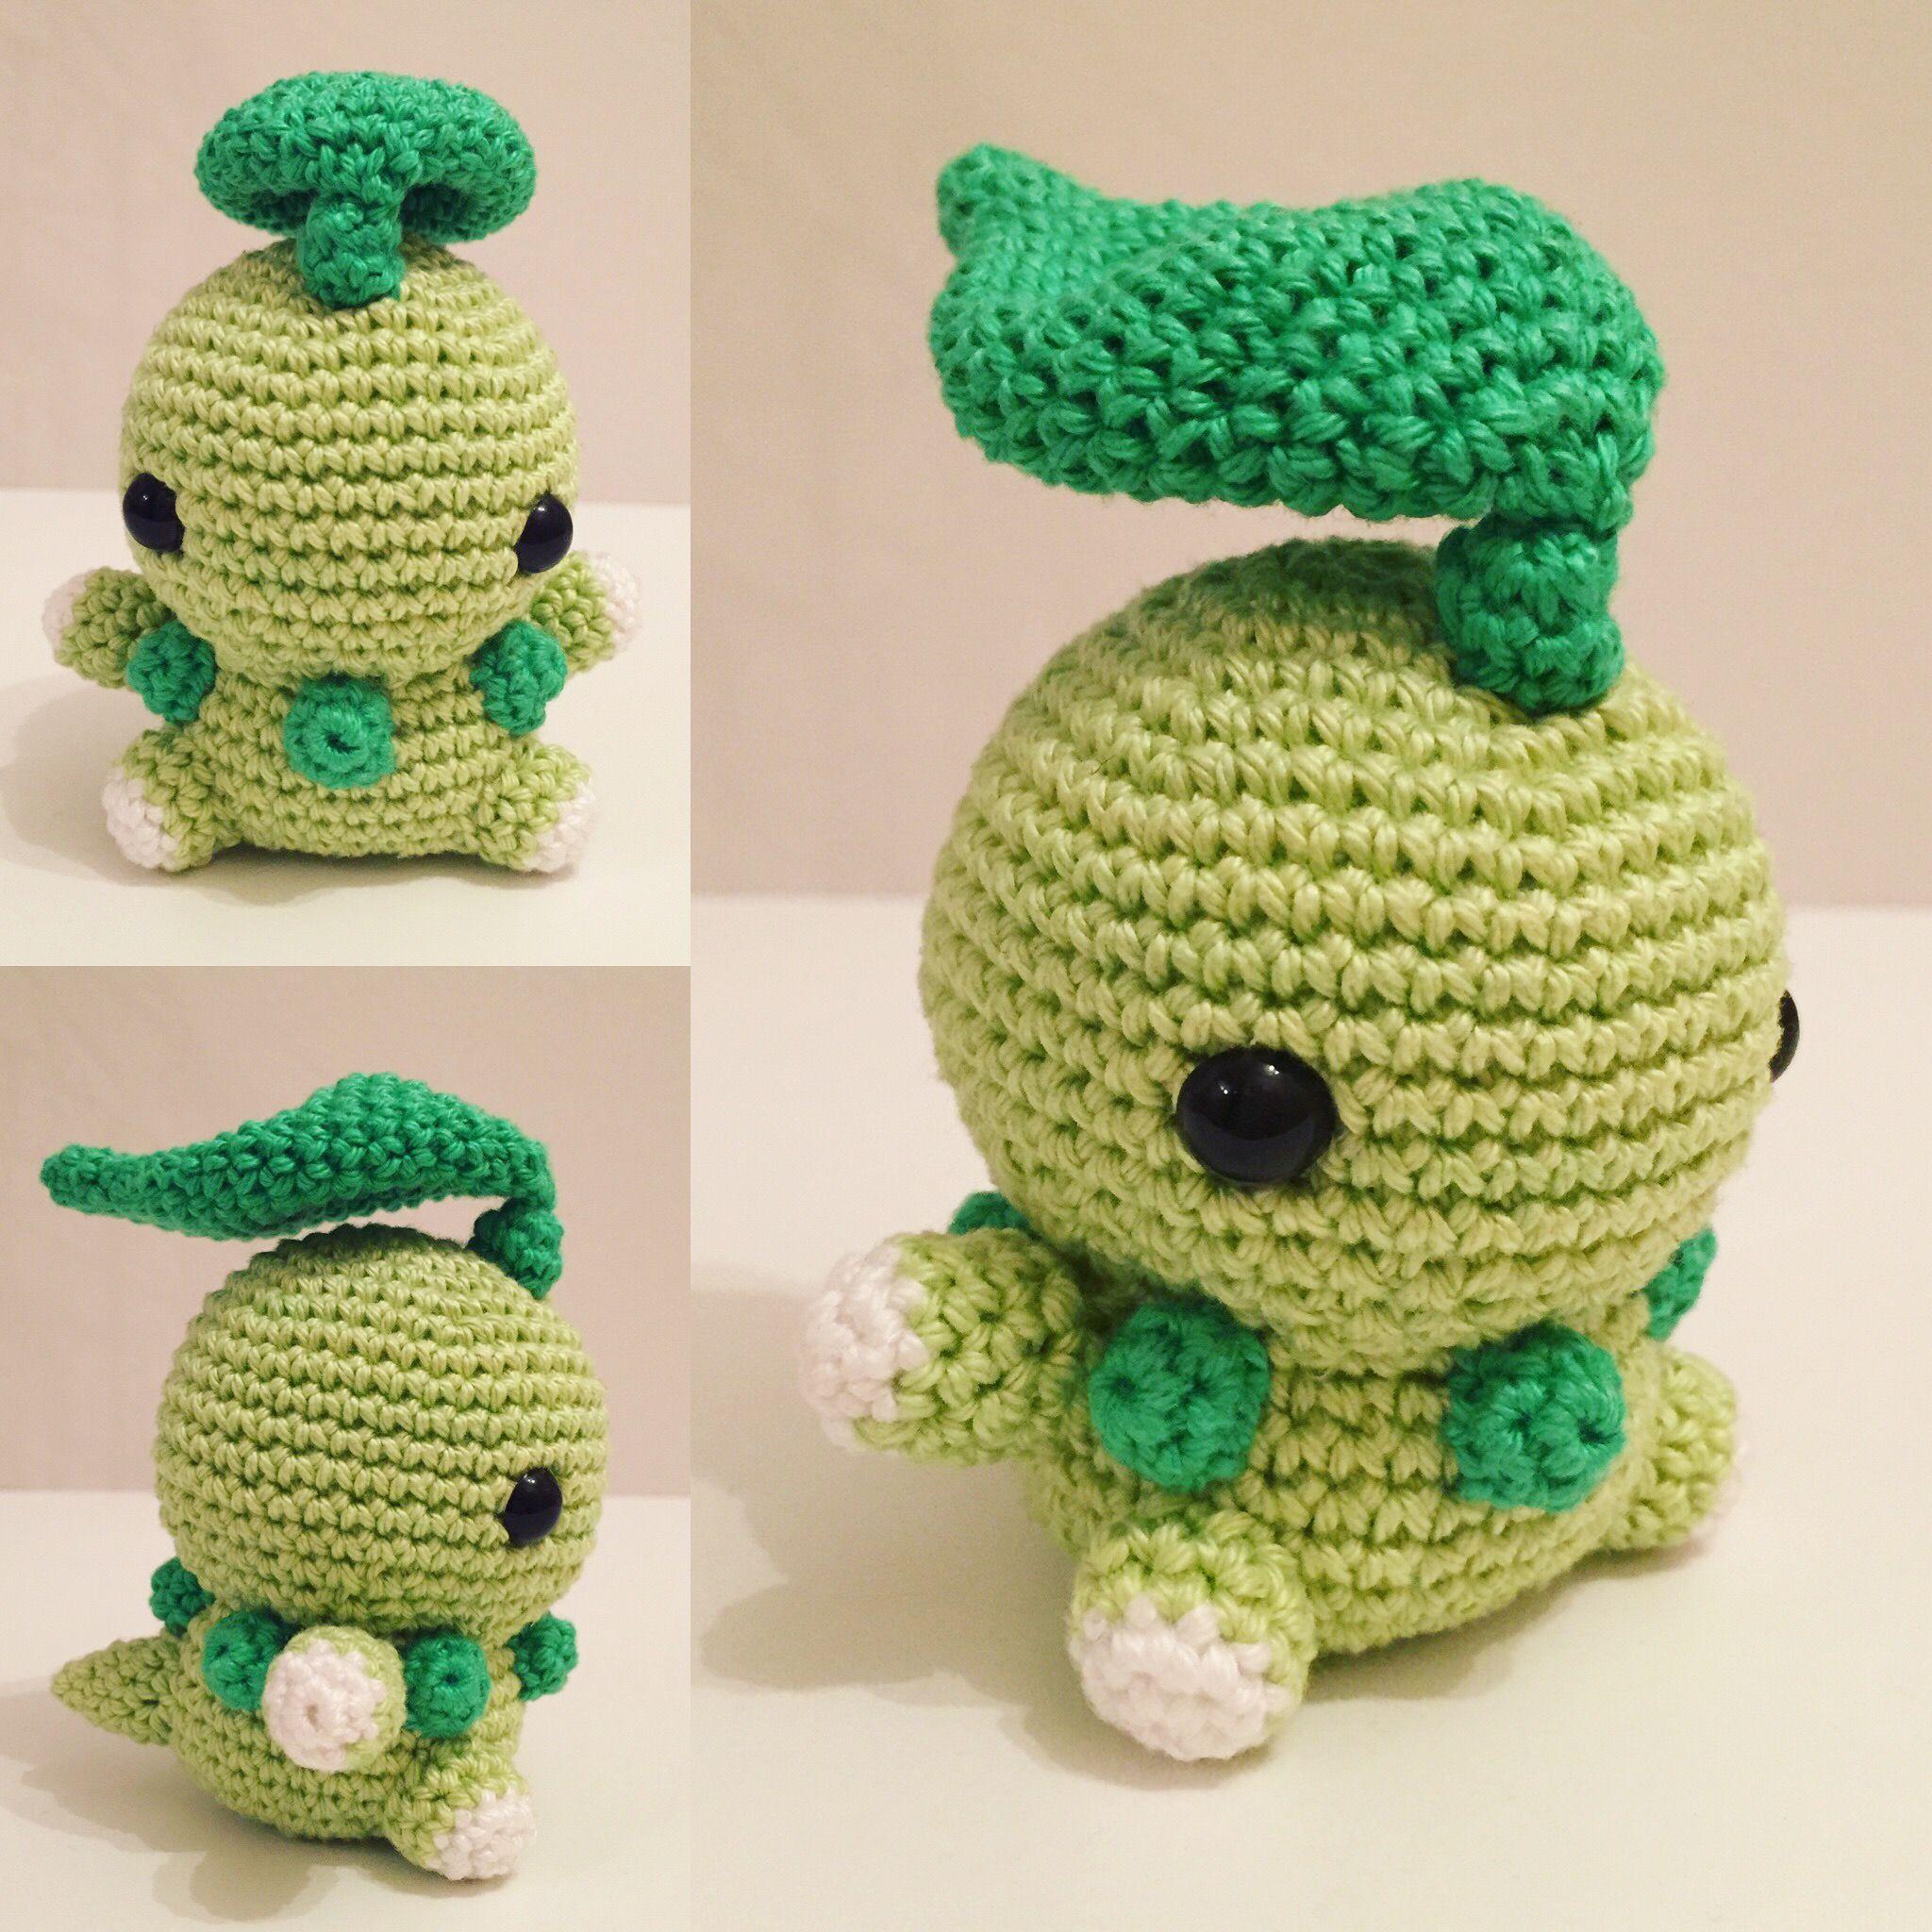 Endivie/Chikorita häkeln/crochet by cute_plushies_crochet | Crafts ...